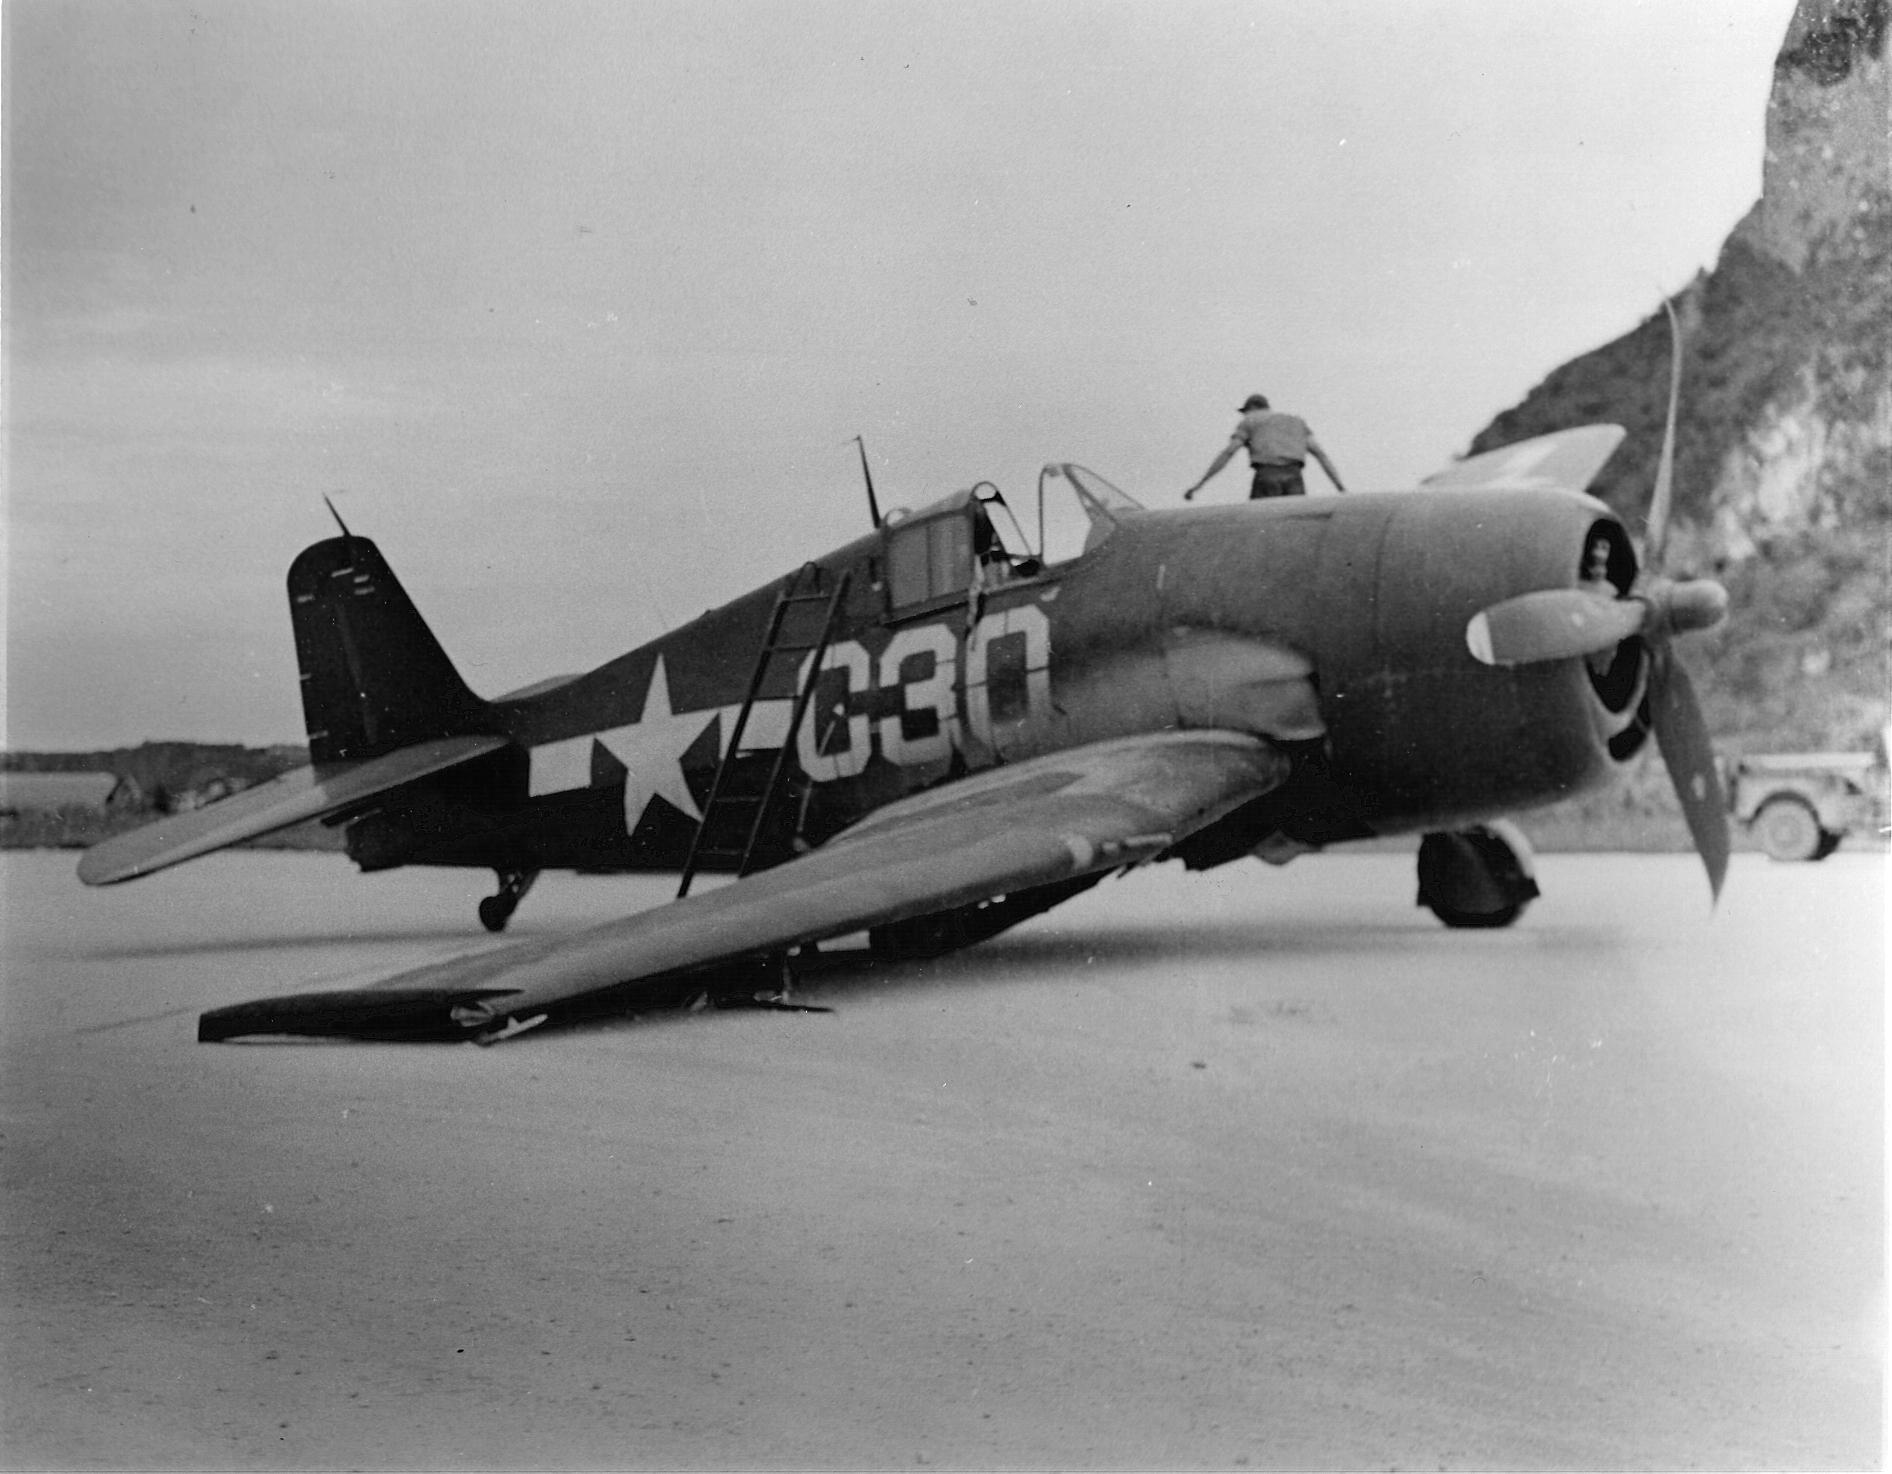 Grumman F6F 5 Hellcat VF 88 Yellow C30 at NAB Marpi Saipan 1945 01